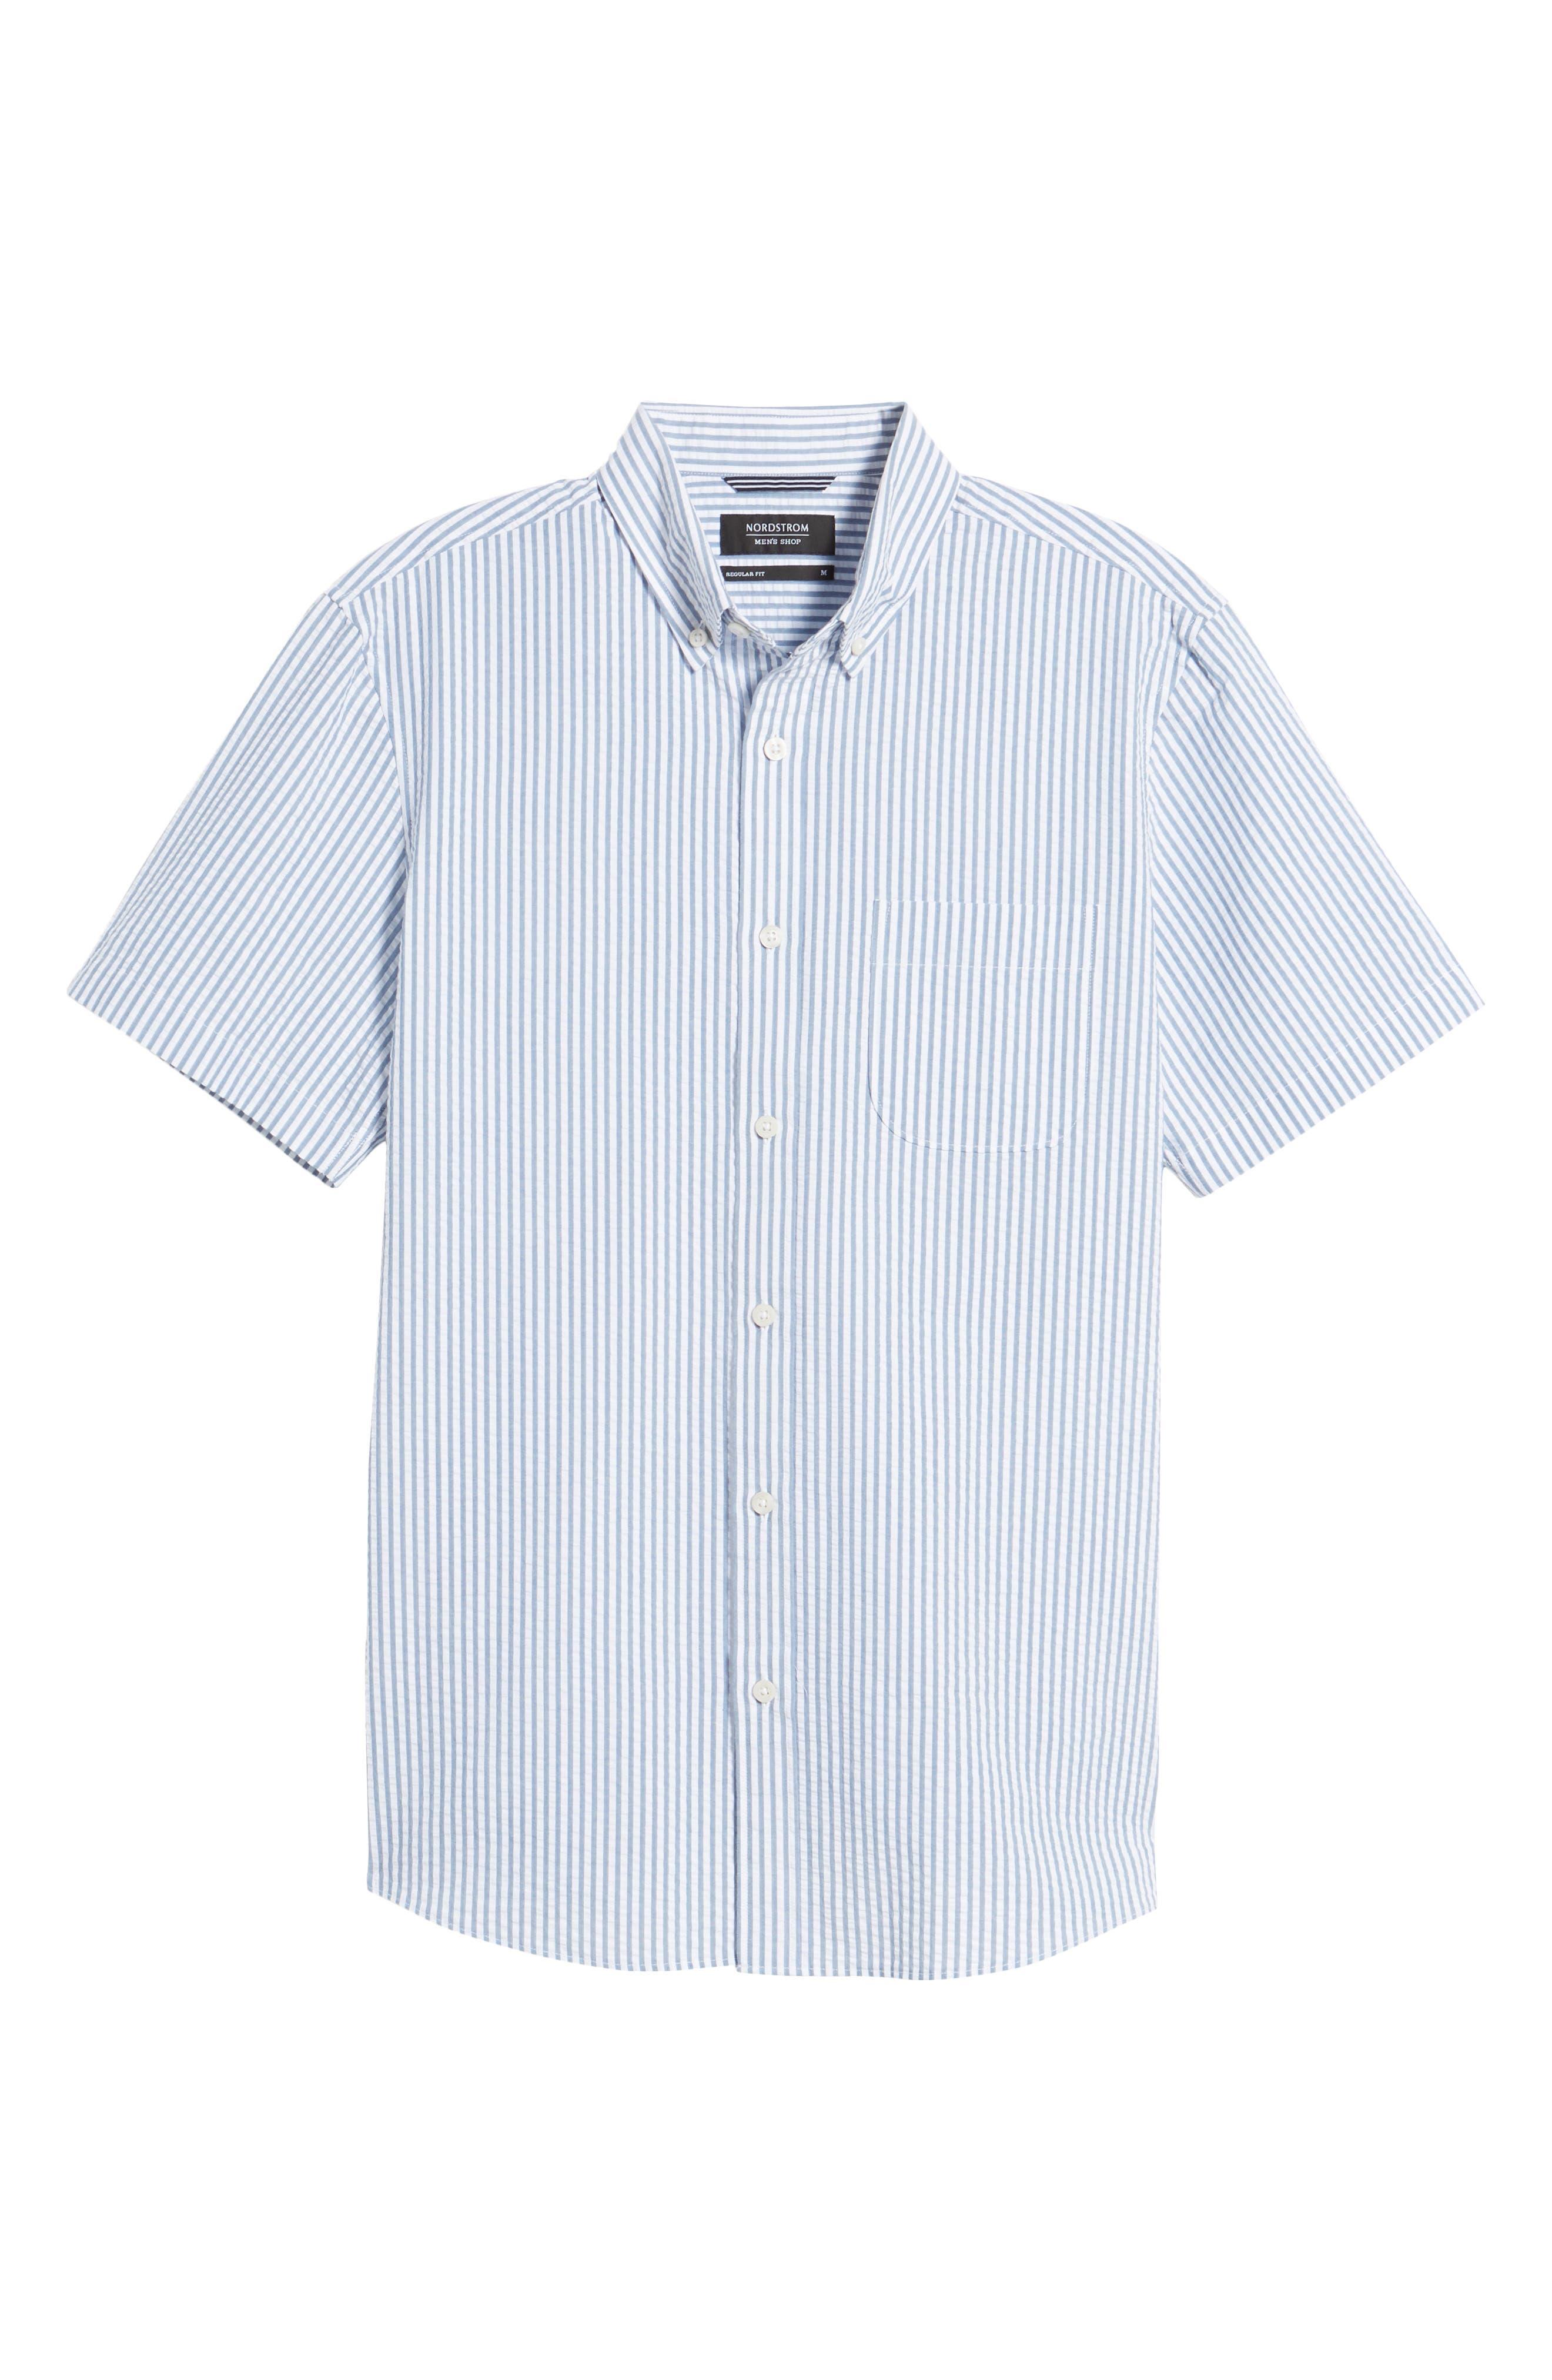 Trim Fit Seersucker Short Sleeve Sport Shirt,                             Alternate thumbnail 6, color,                             White Navy Seersucker Stripe